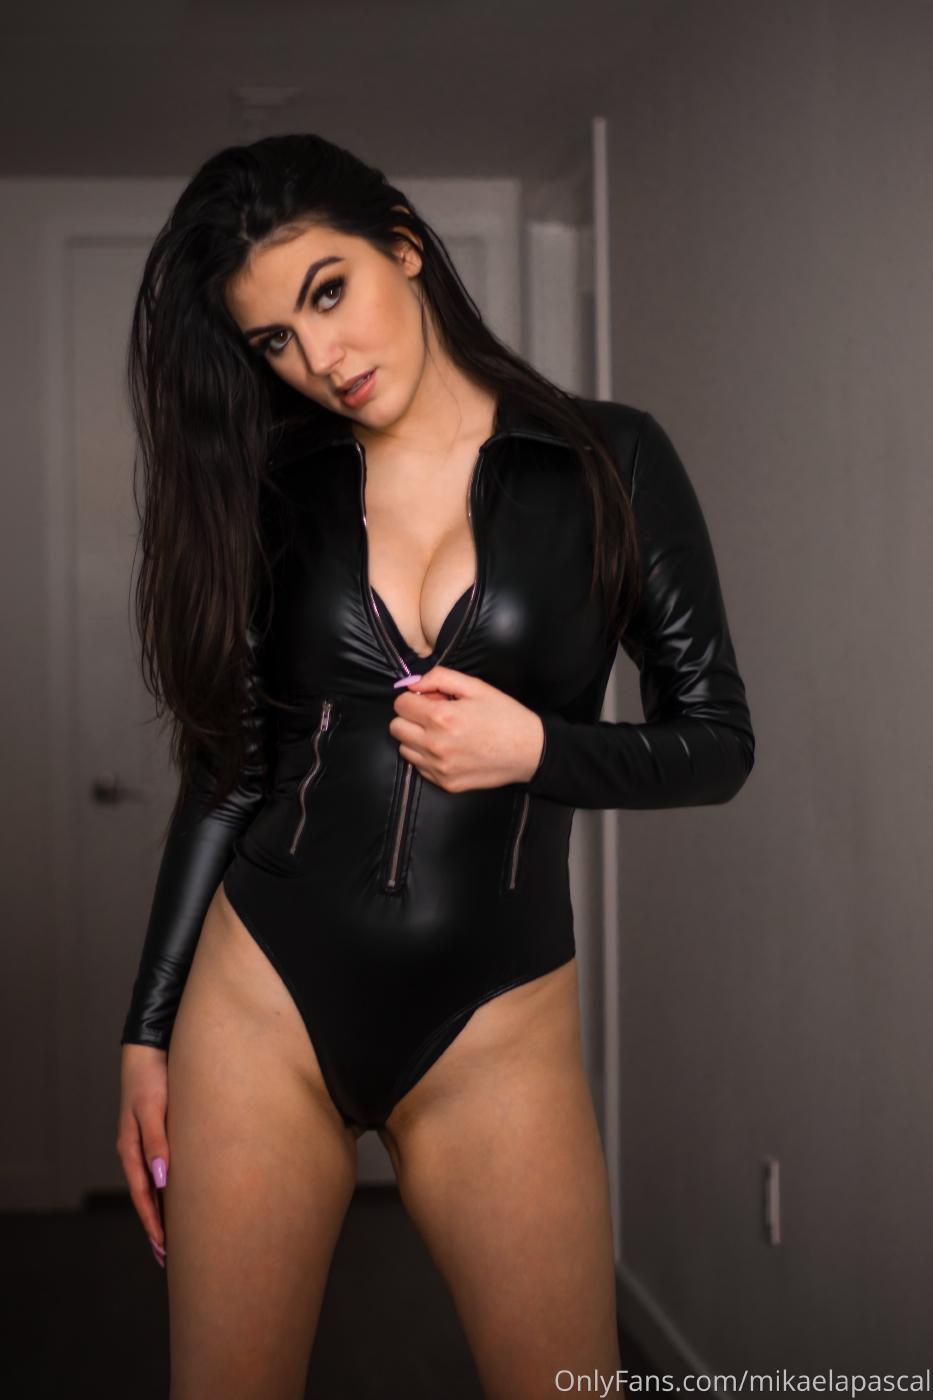 Mikaela Pascal Sexy Leather Bodysuit Onlyfans Set Leaked 0006